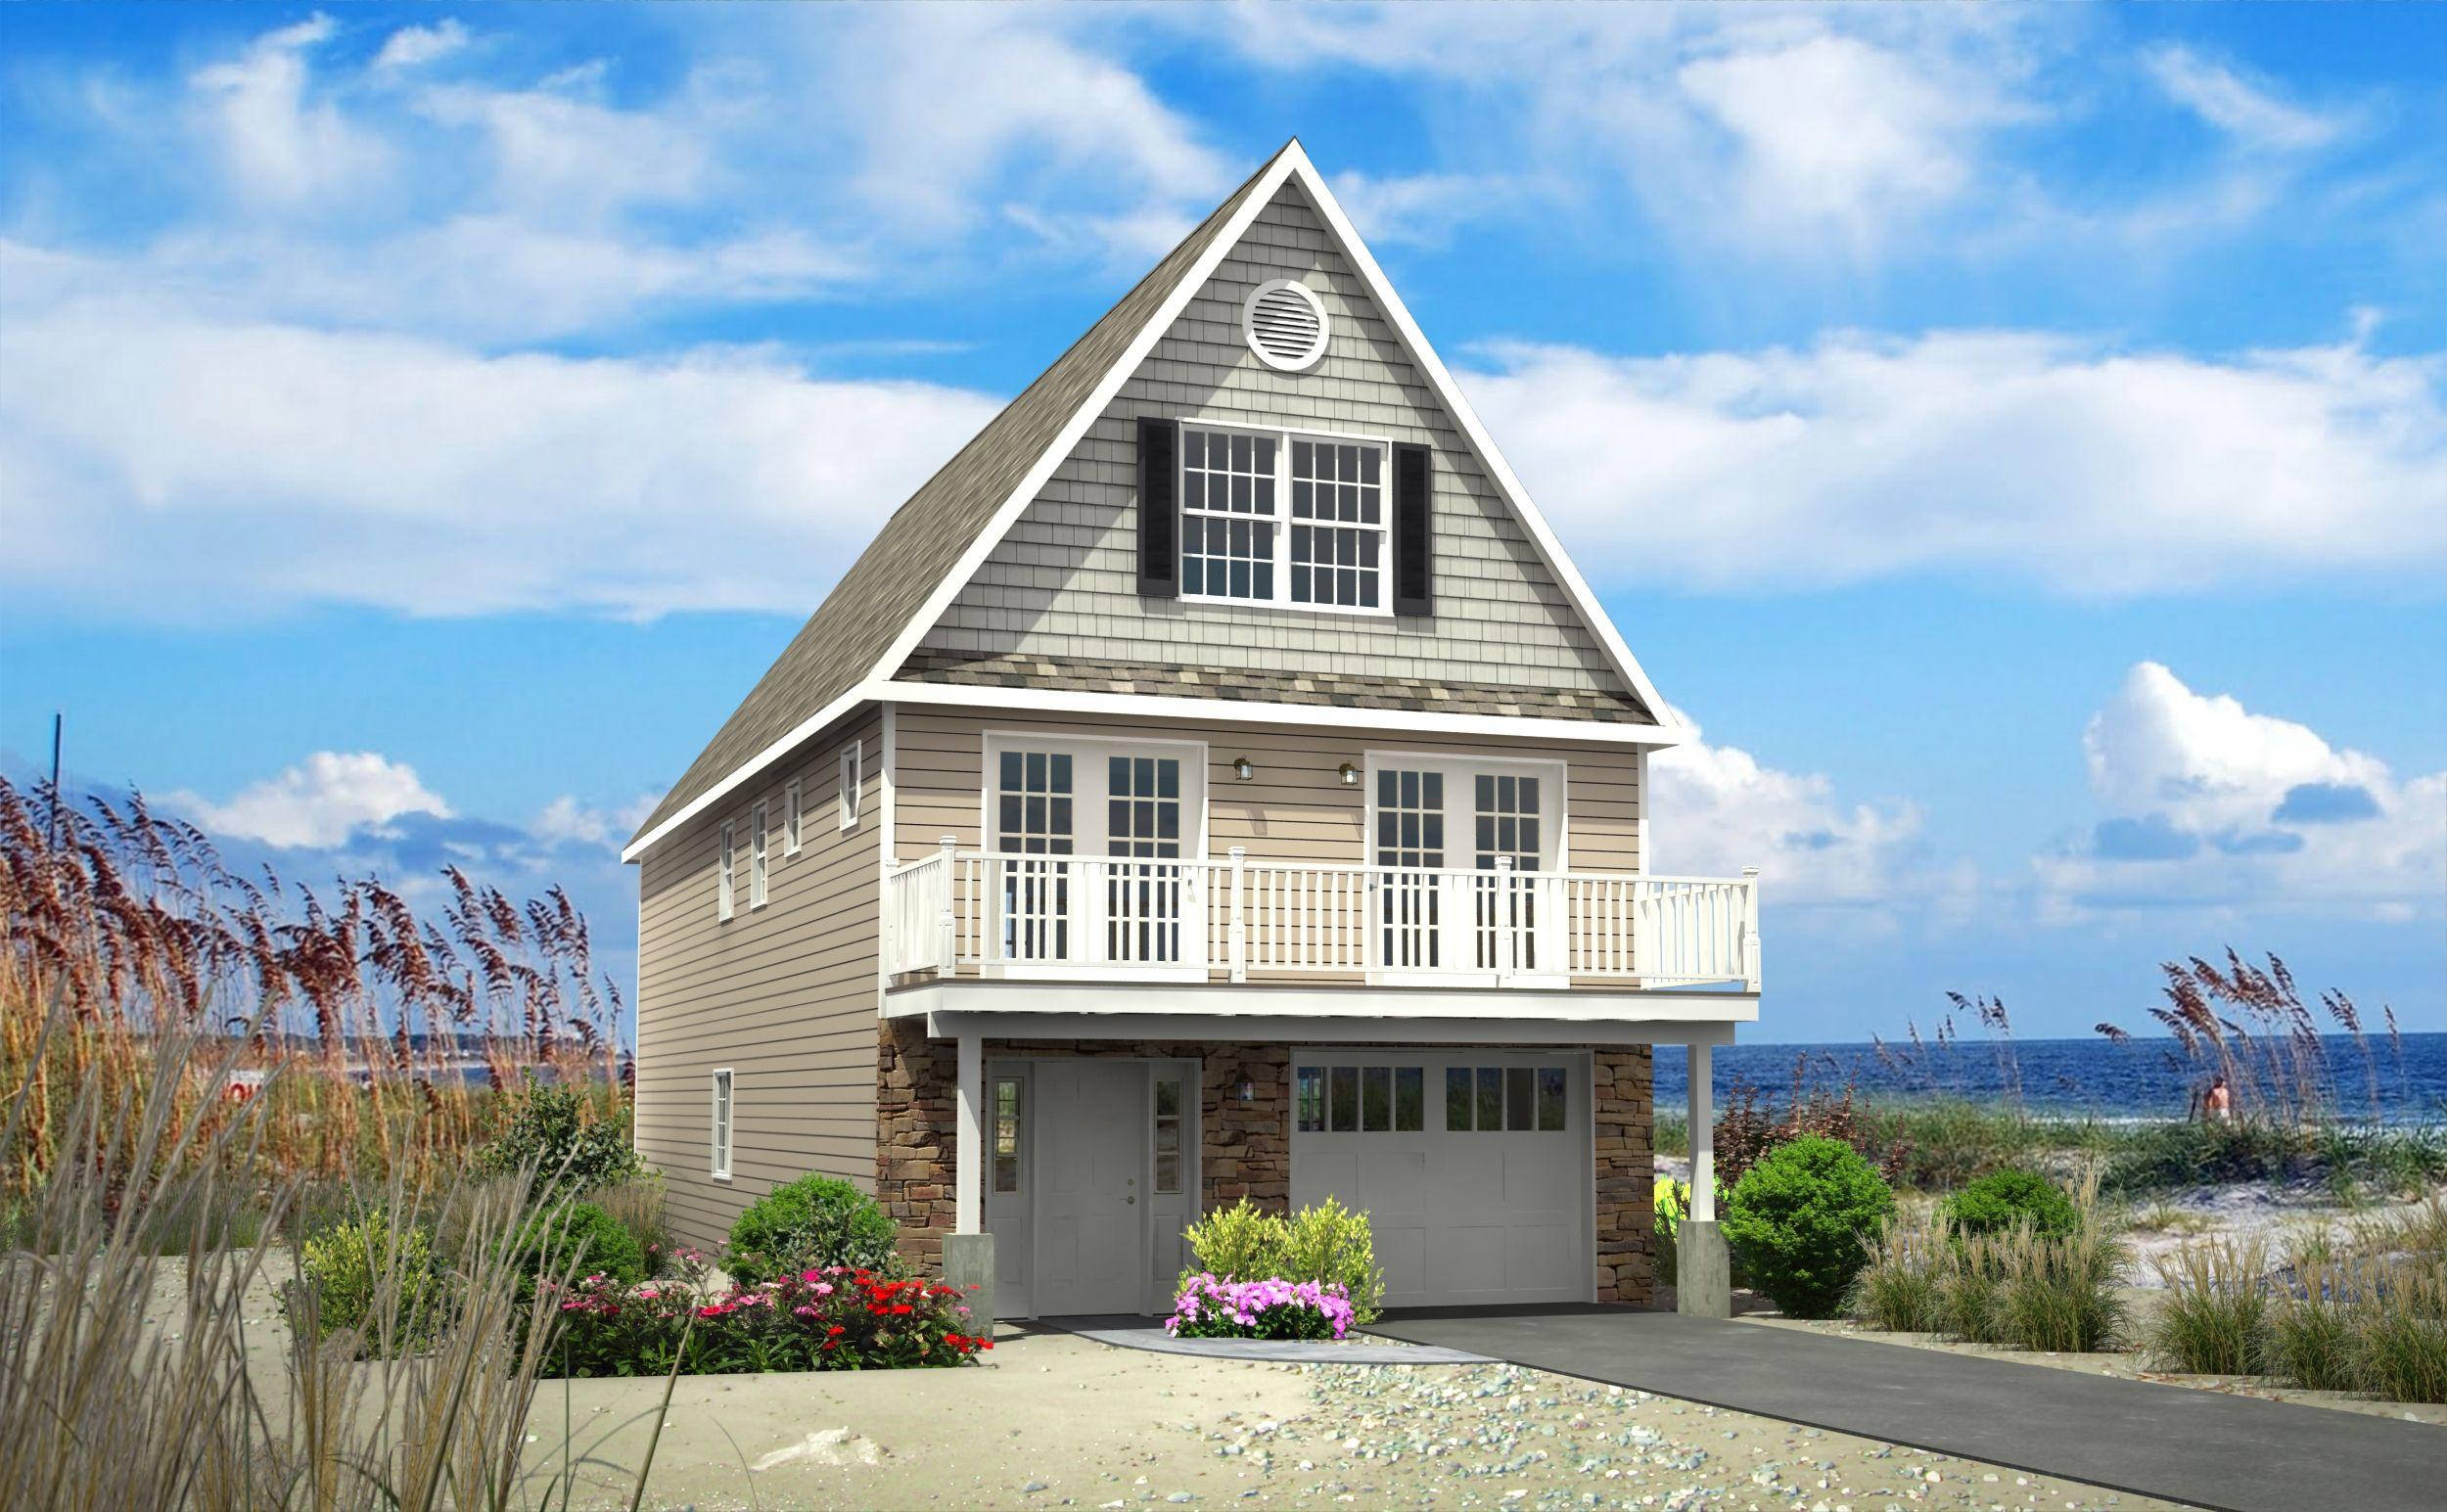 Rendering Of Model Home On Long Beach Island The Builder Is Phoenix Industries